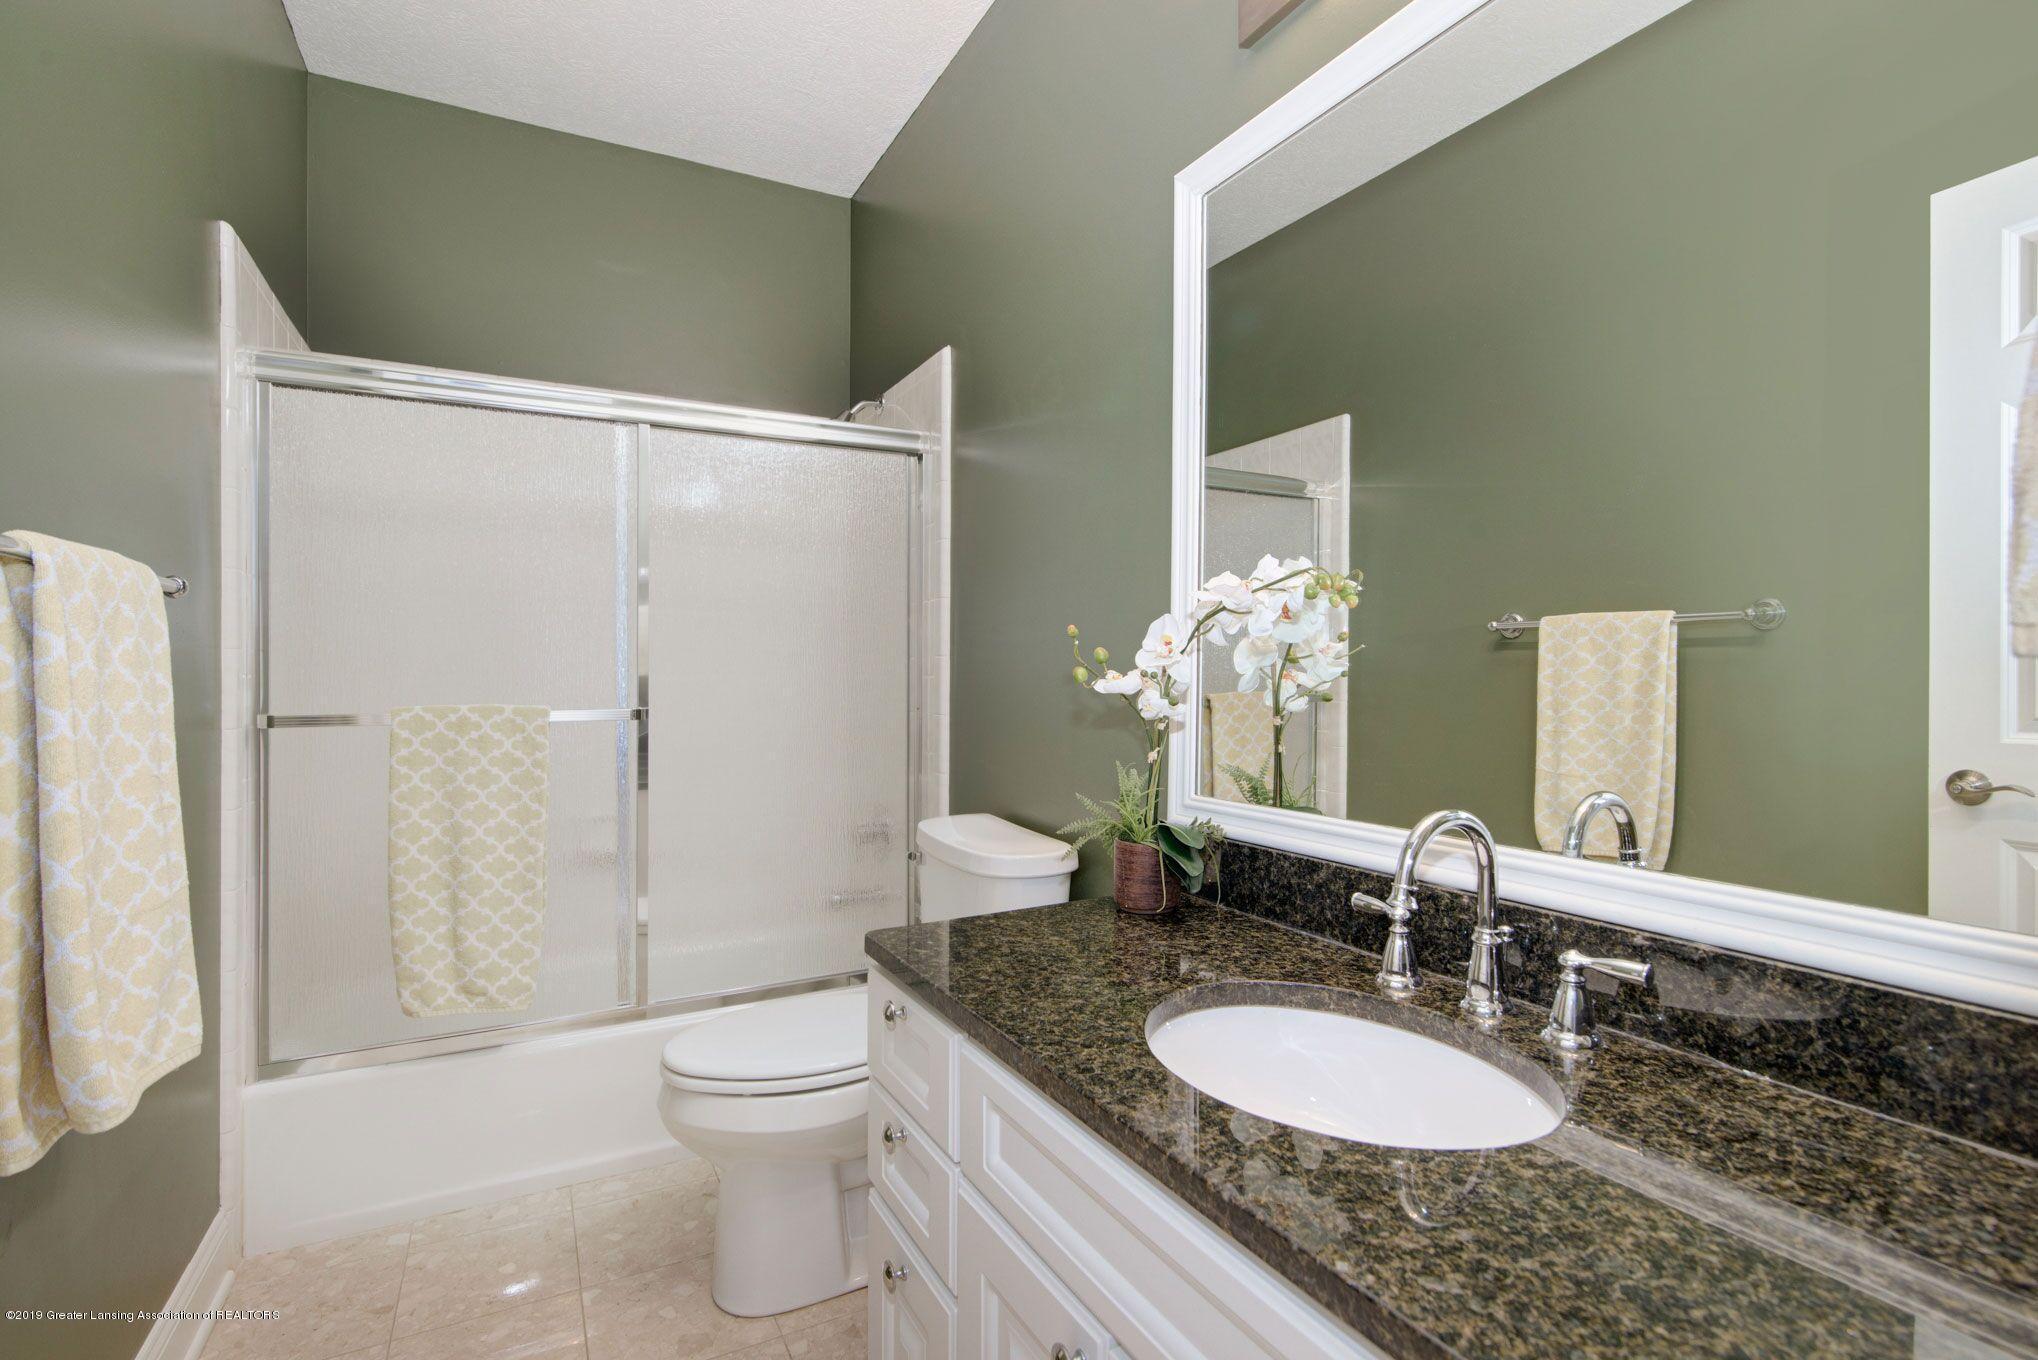 6389 Ridgepond Dr - Main Floor Bath - 32